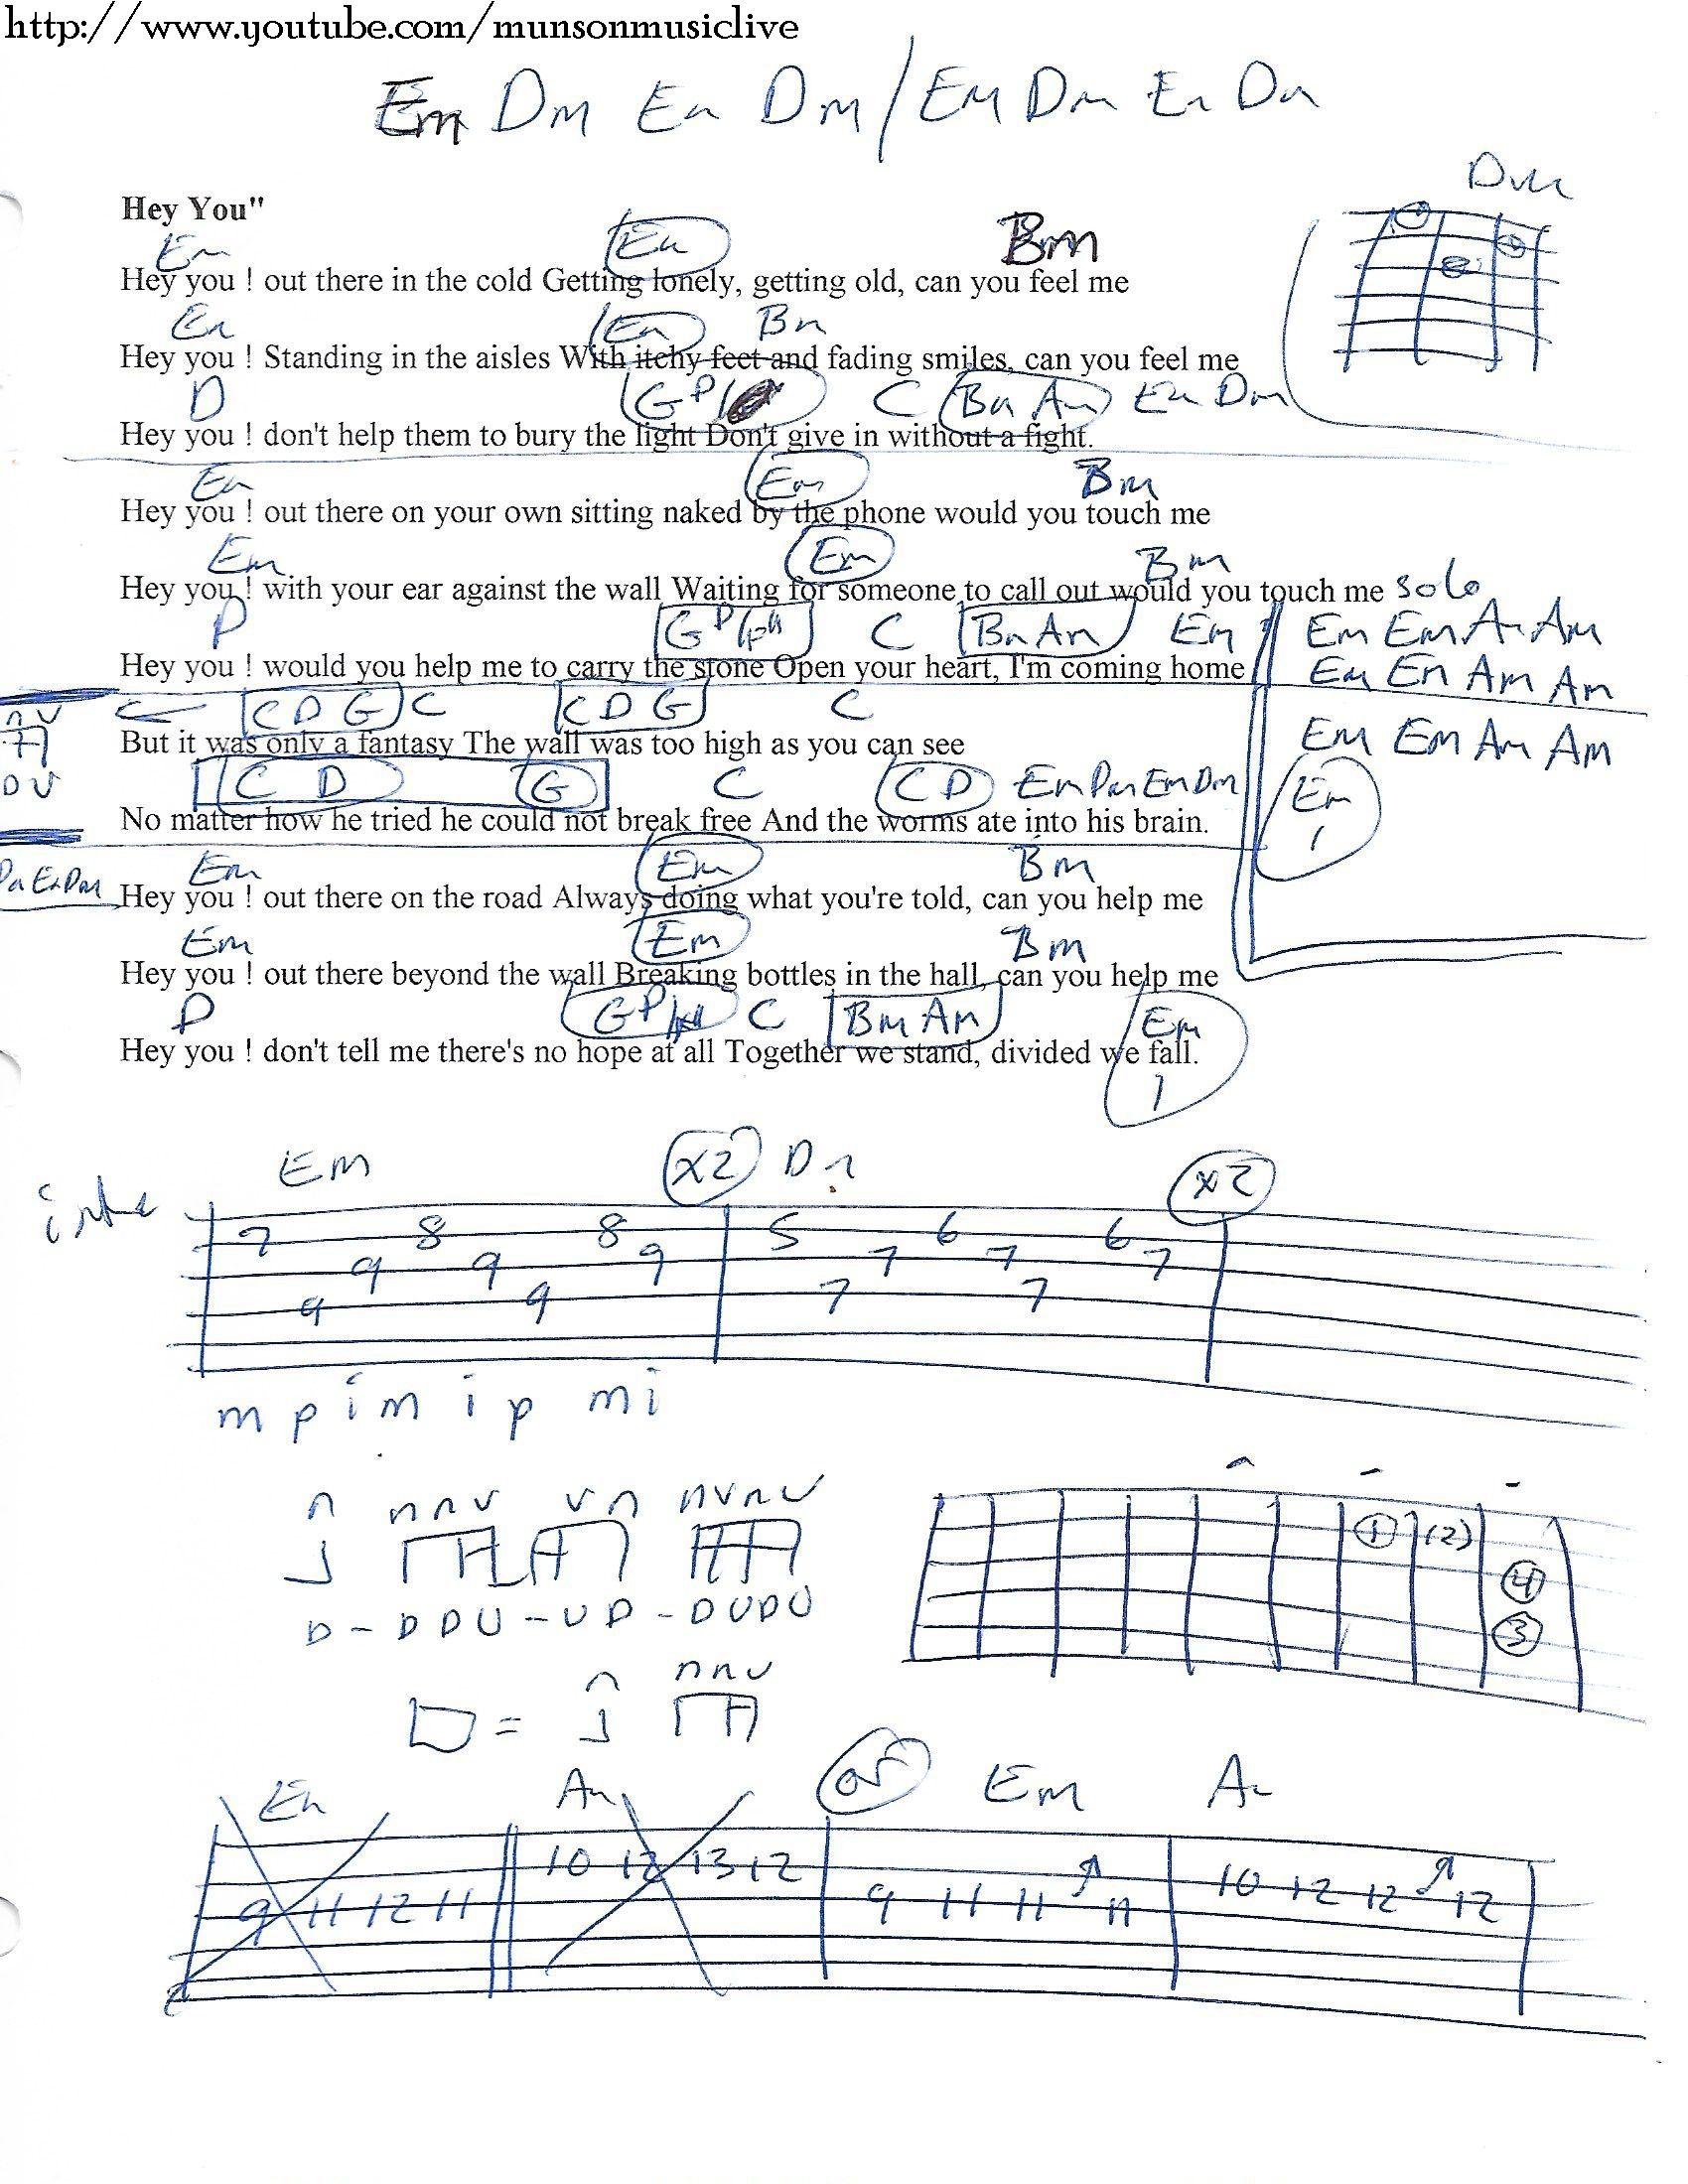 Hey You Pink Floyd Guitar Chord Chart Songs Pinterest Guitar